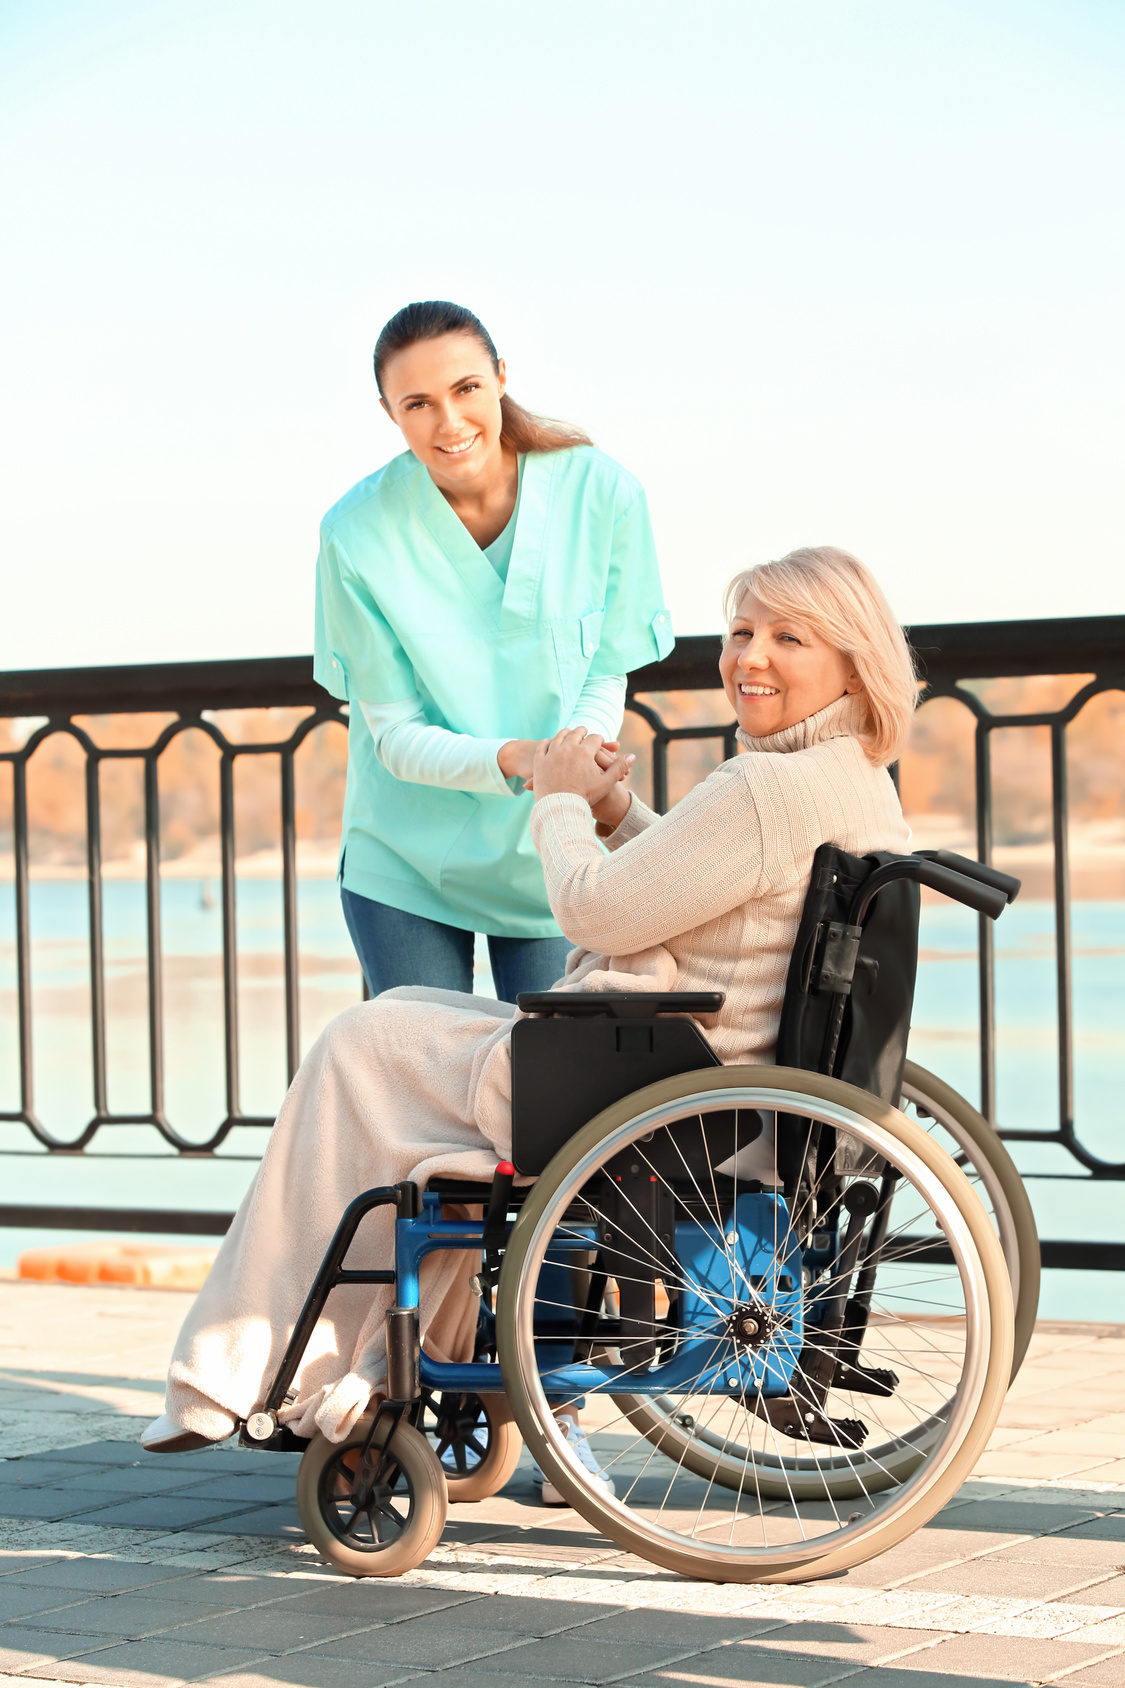 Assisting Hands Home Care - Dallas, Fort Worth & Surrounding Areas - Dallas, TX 75240 - (214)865-7870 | ShowMeLocal.com